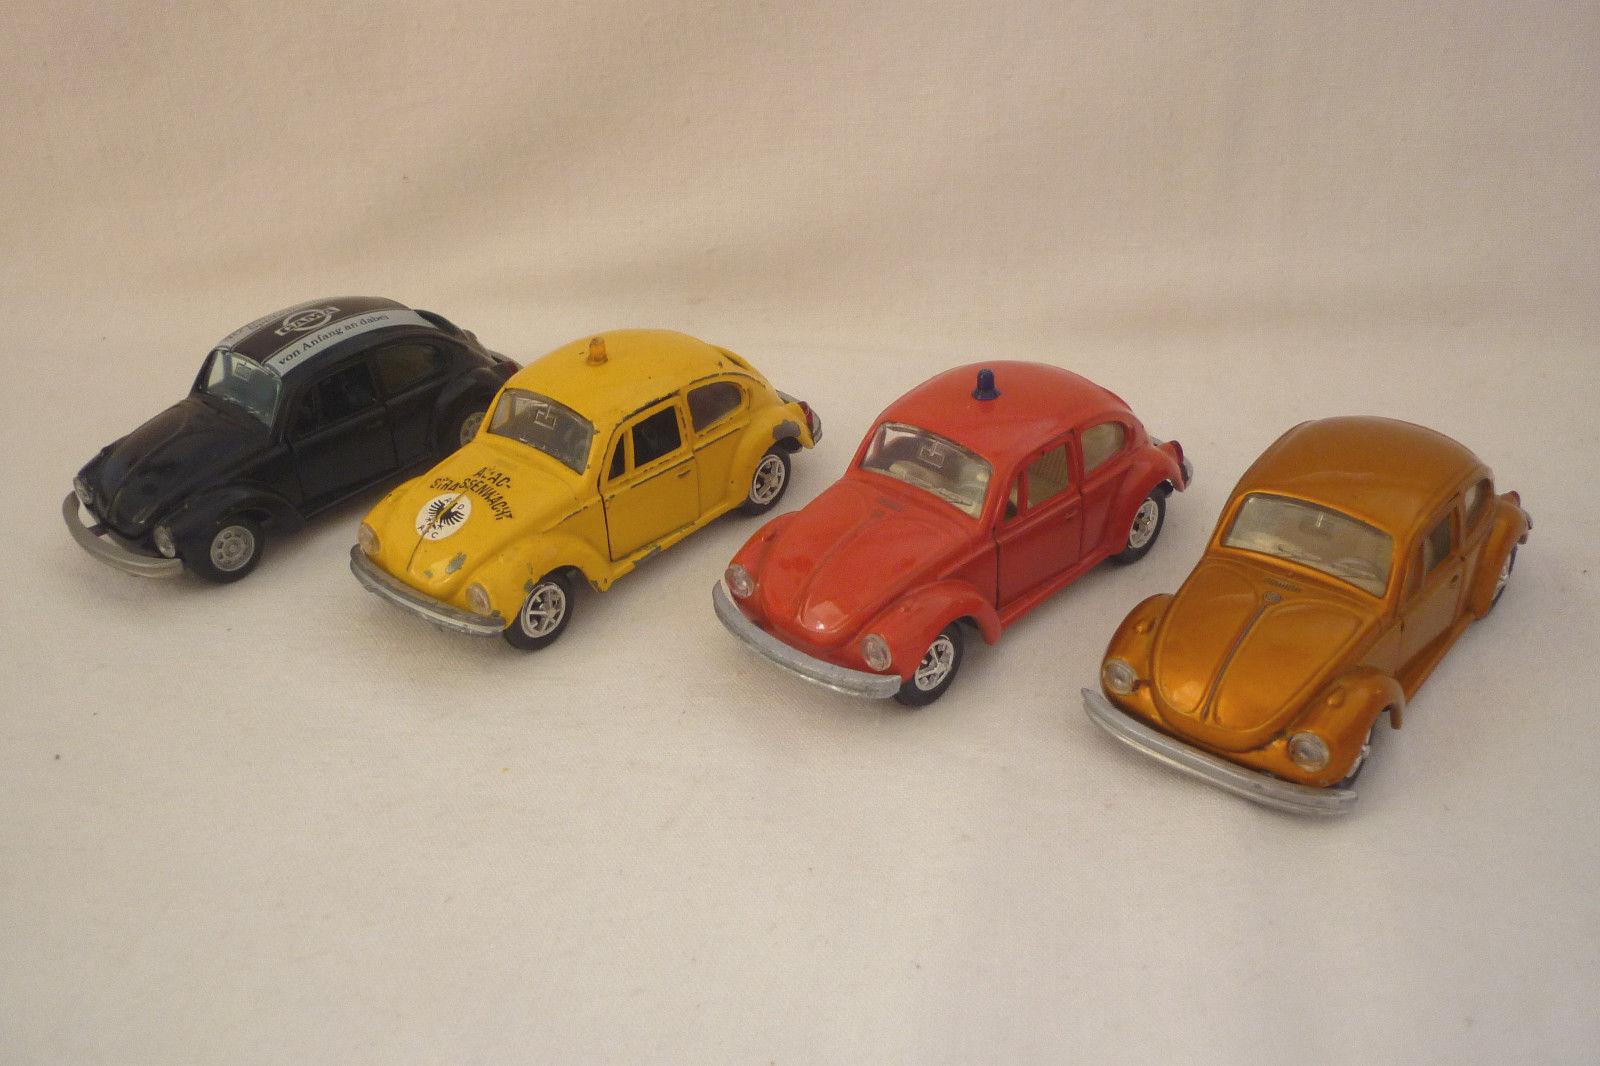 Gama Mini Model-Bundle - 4 x 1302 VW-no 898  - 1 43 - (4.div-16)  peu coûteux